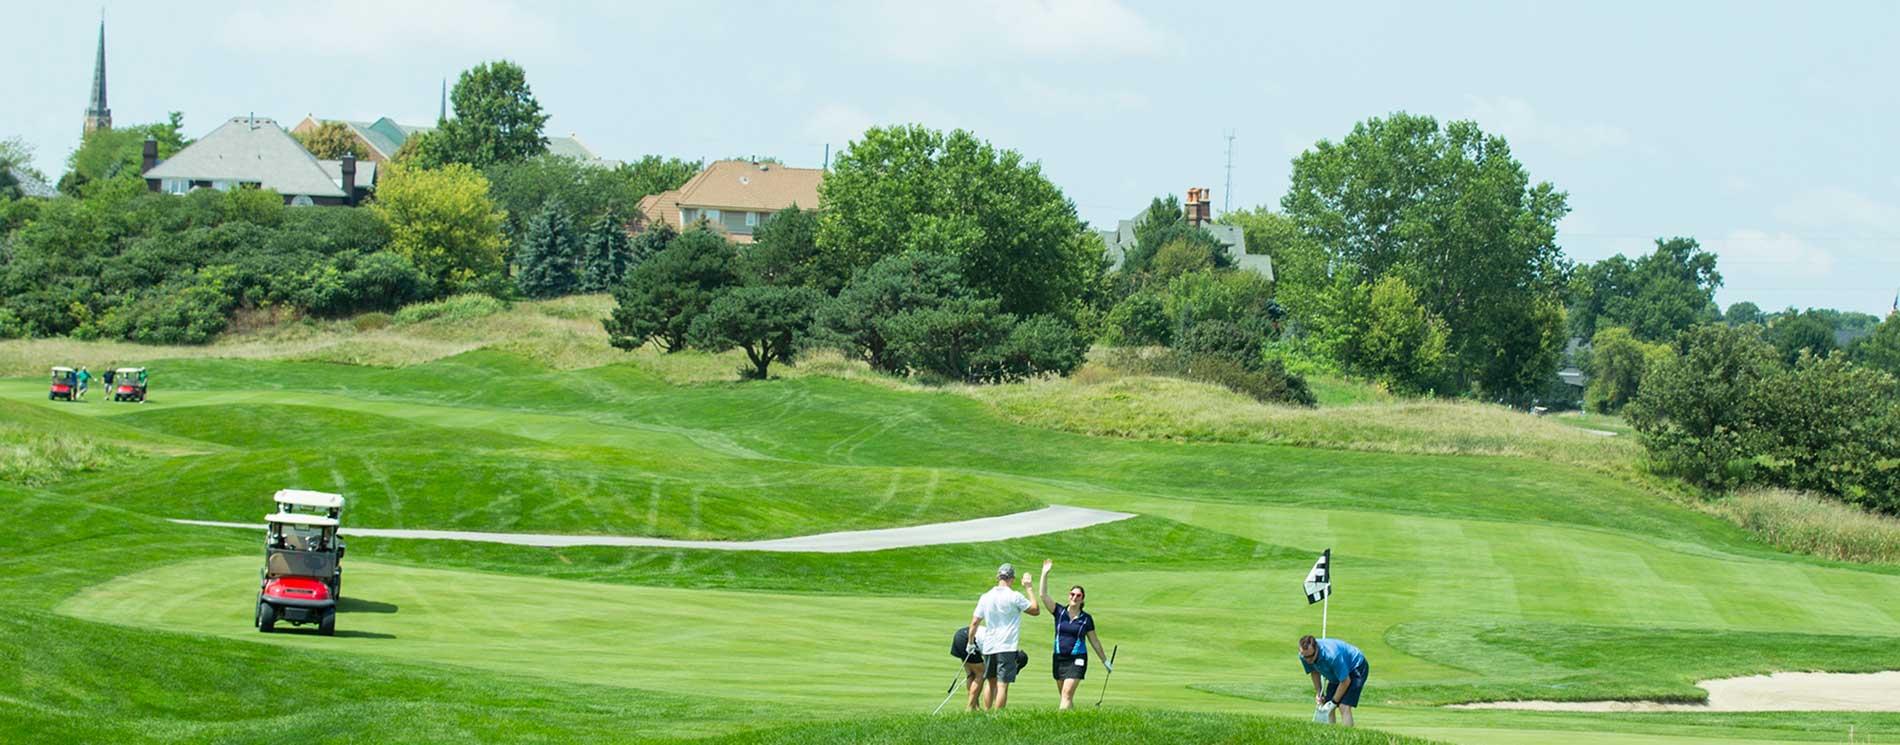 ORA Annual Golf Scramble